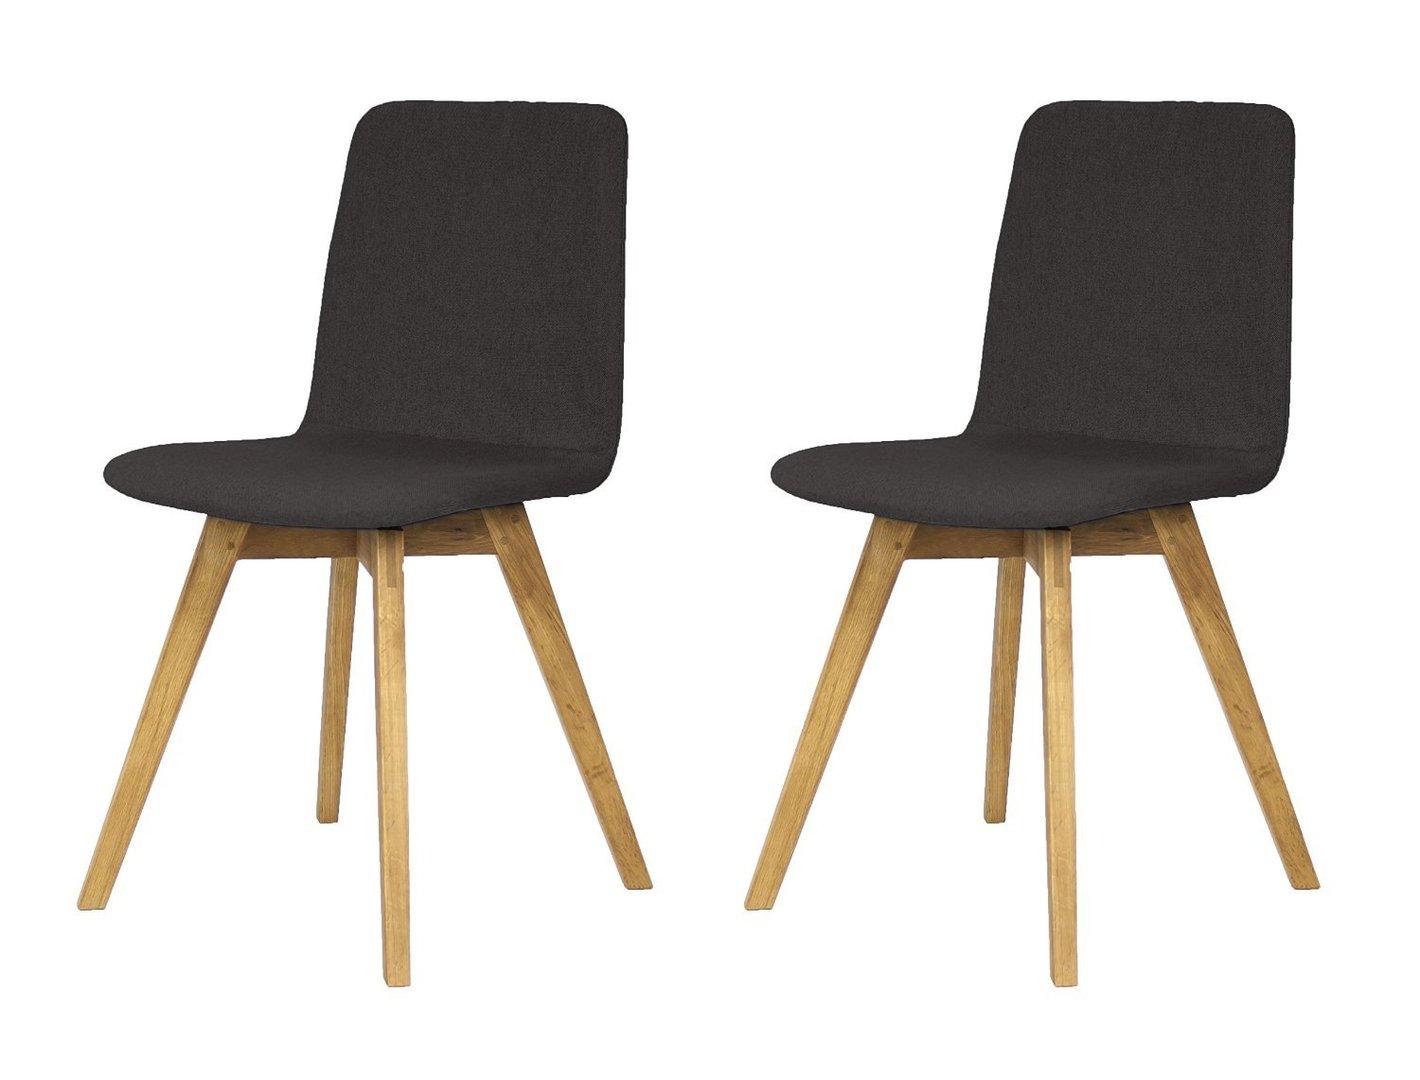 tenzo tequila mia stuhl buerado. Black Bedroom Furniture Sets. Home Design Ideas